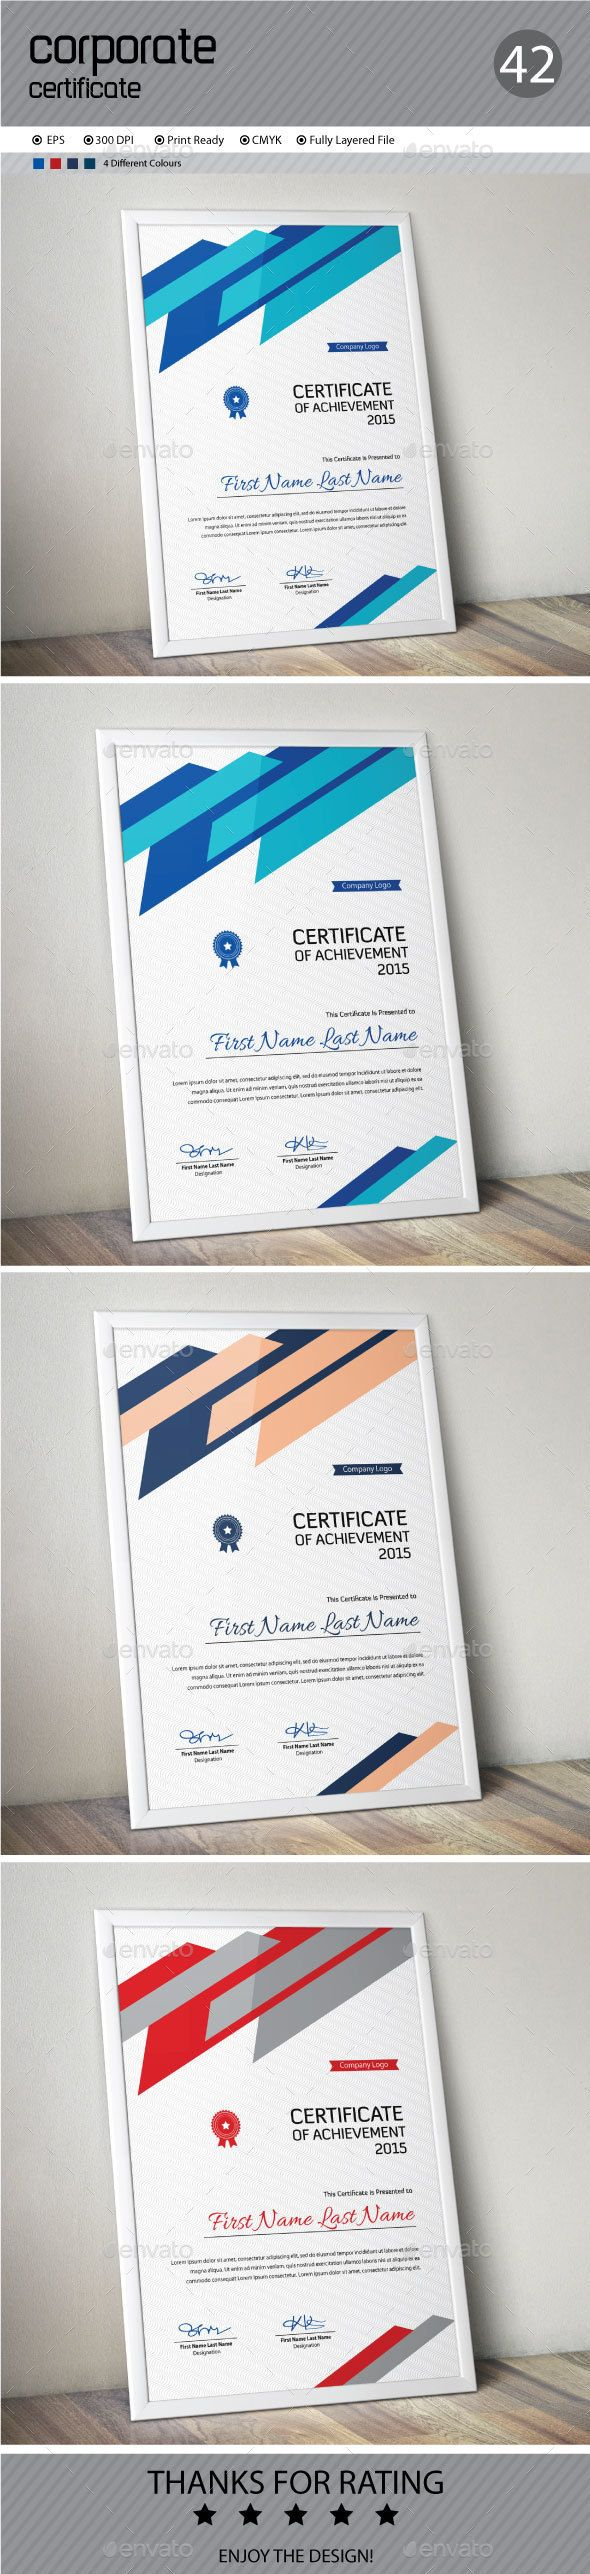 Certificate Template Vector EPS. Download here: http://graphicriver.net/item/certificate/14275424?ref=ksioks